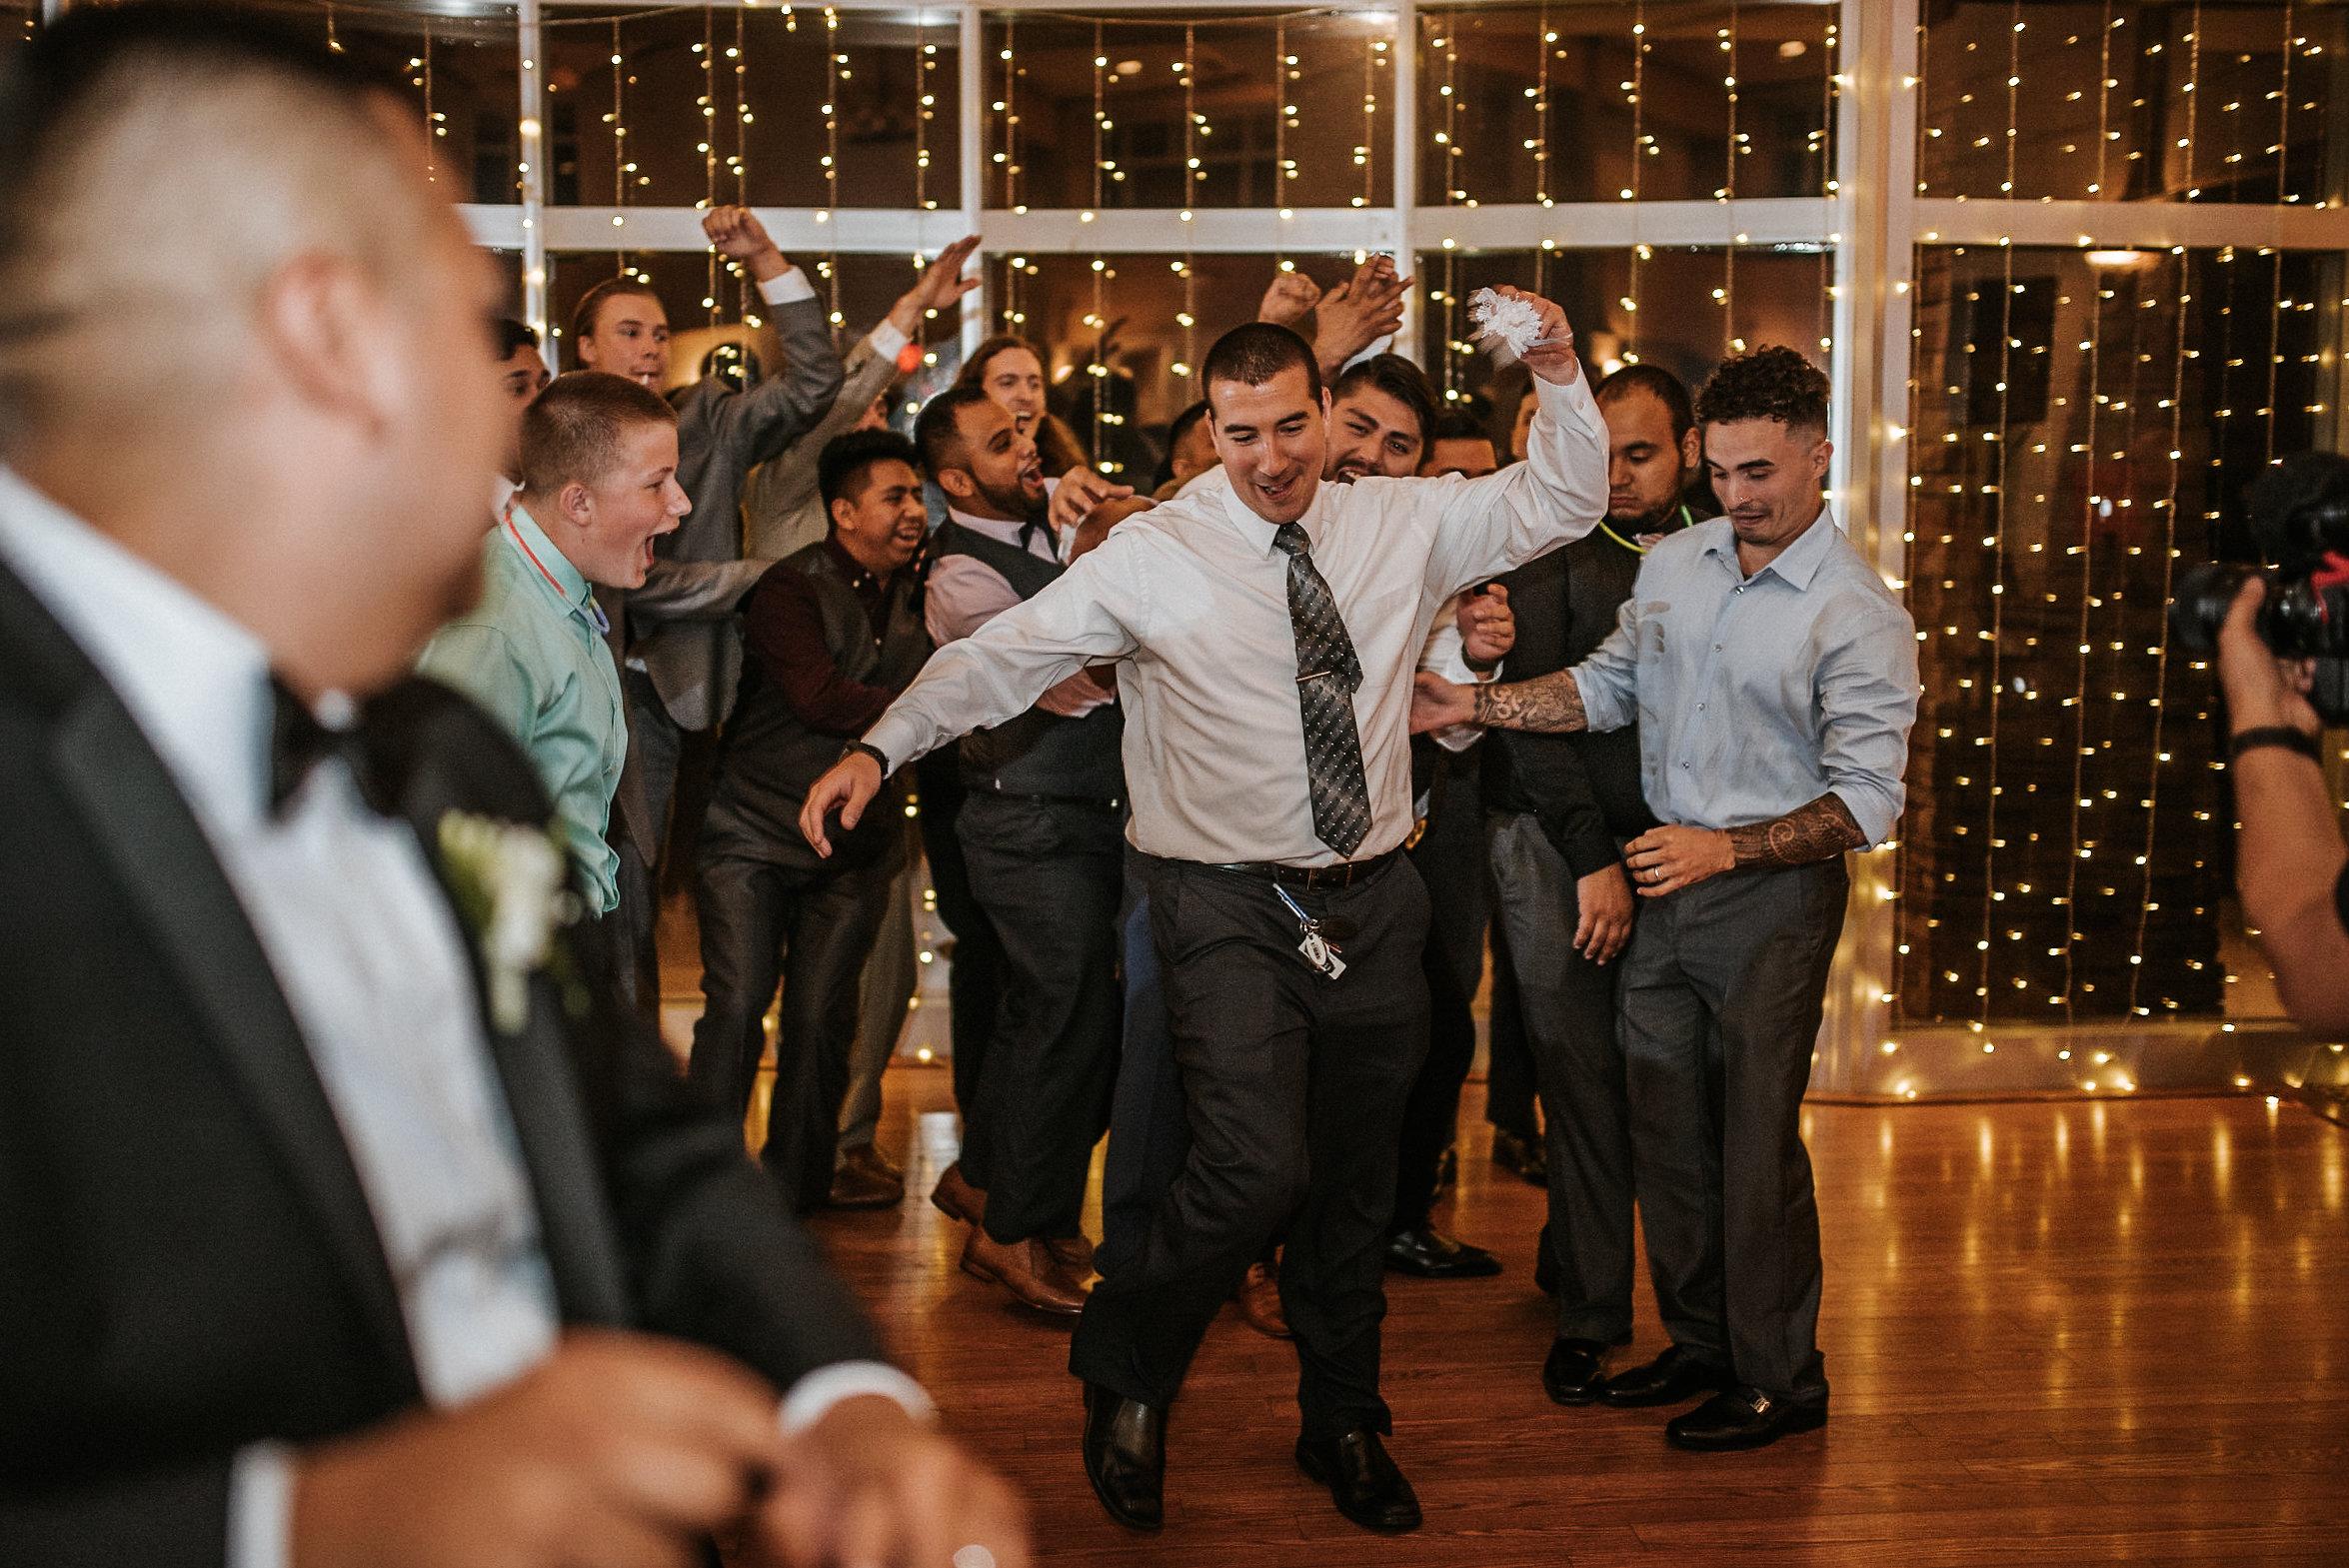 Men catch garter at wedding